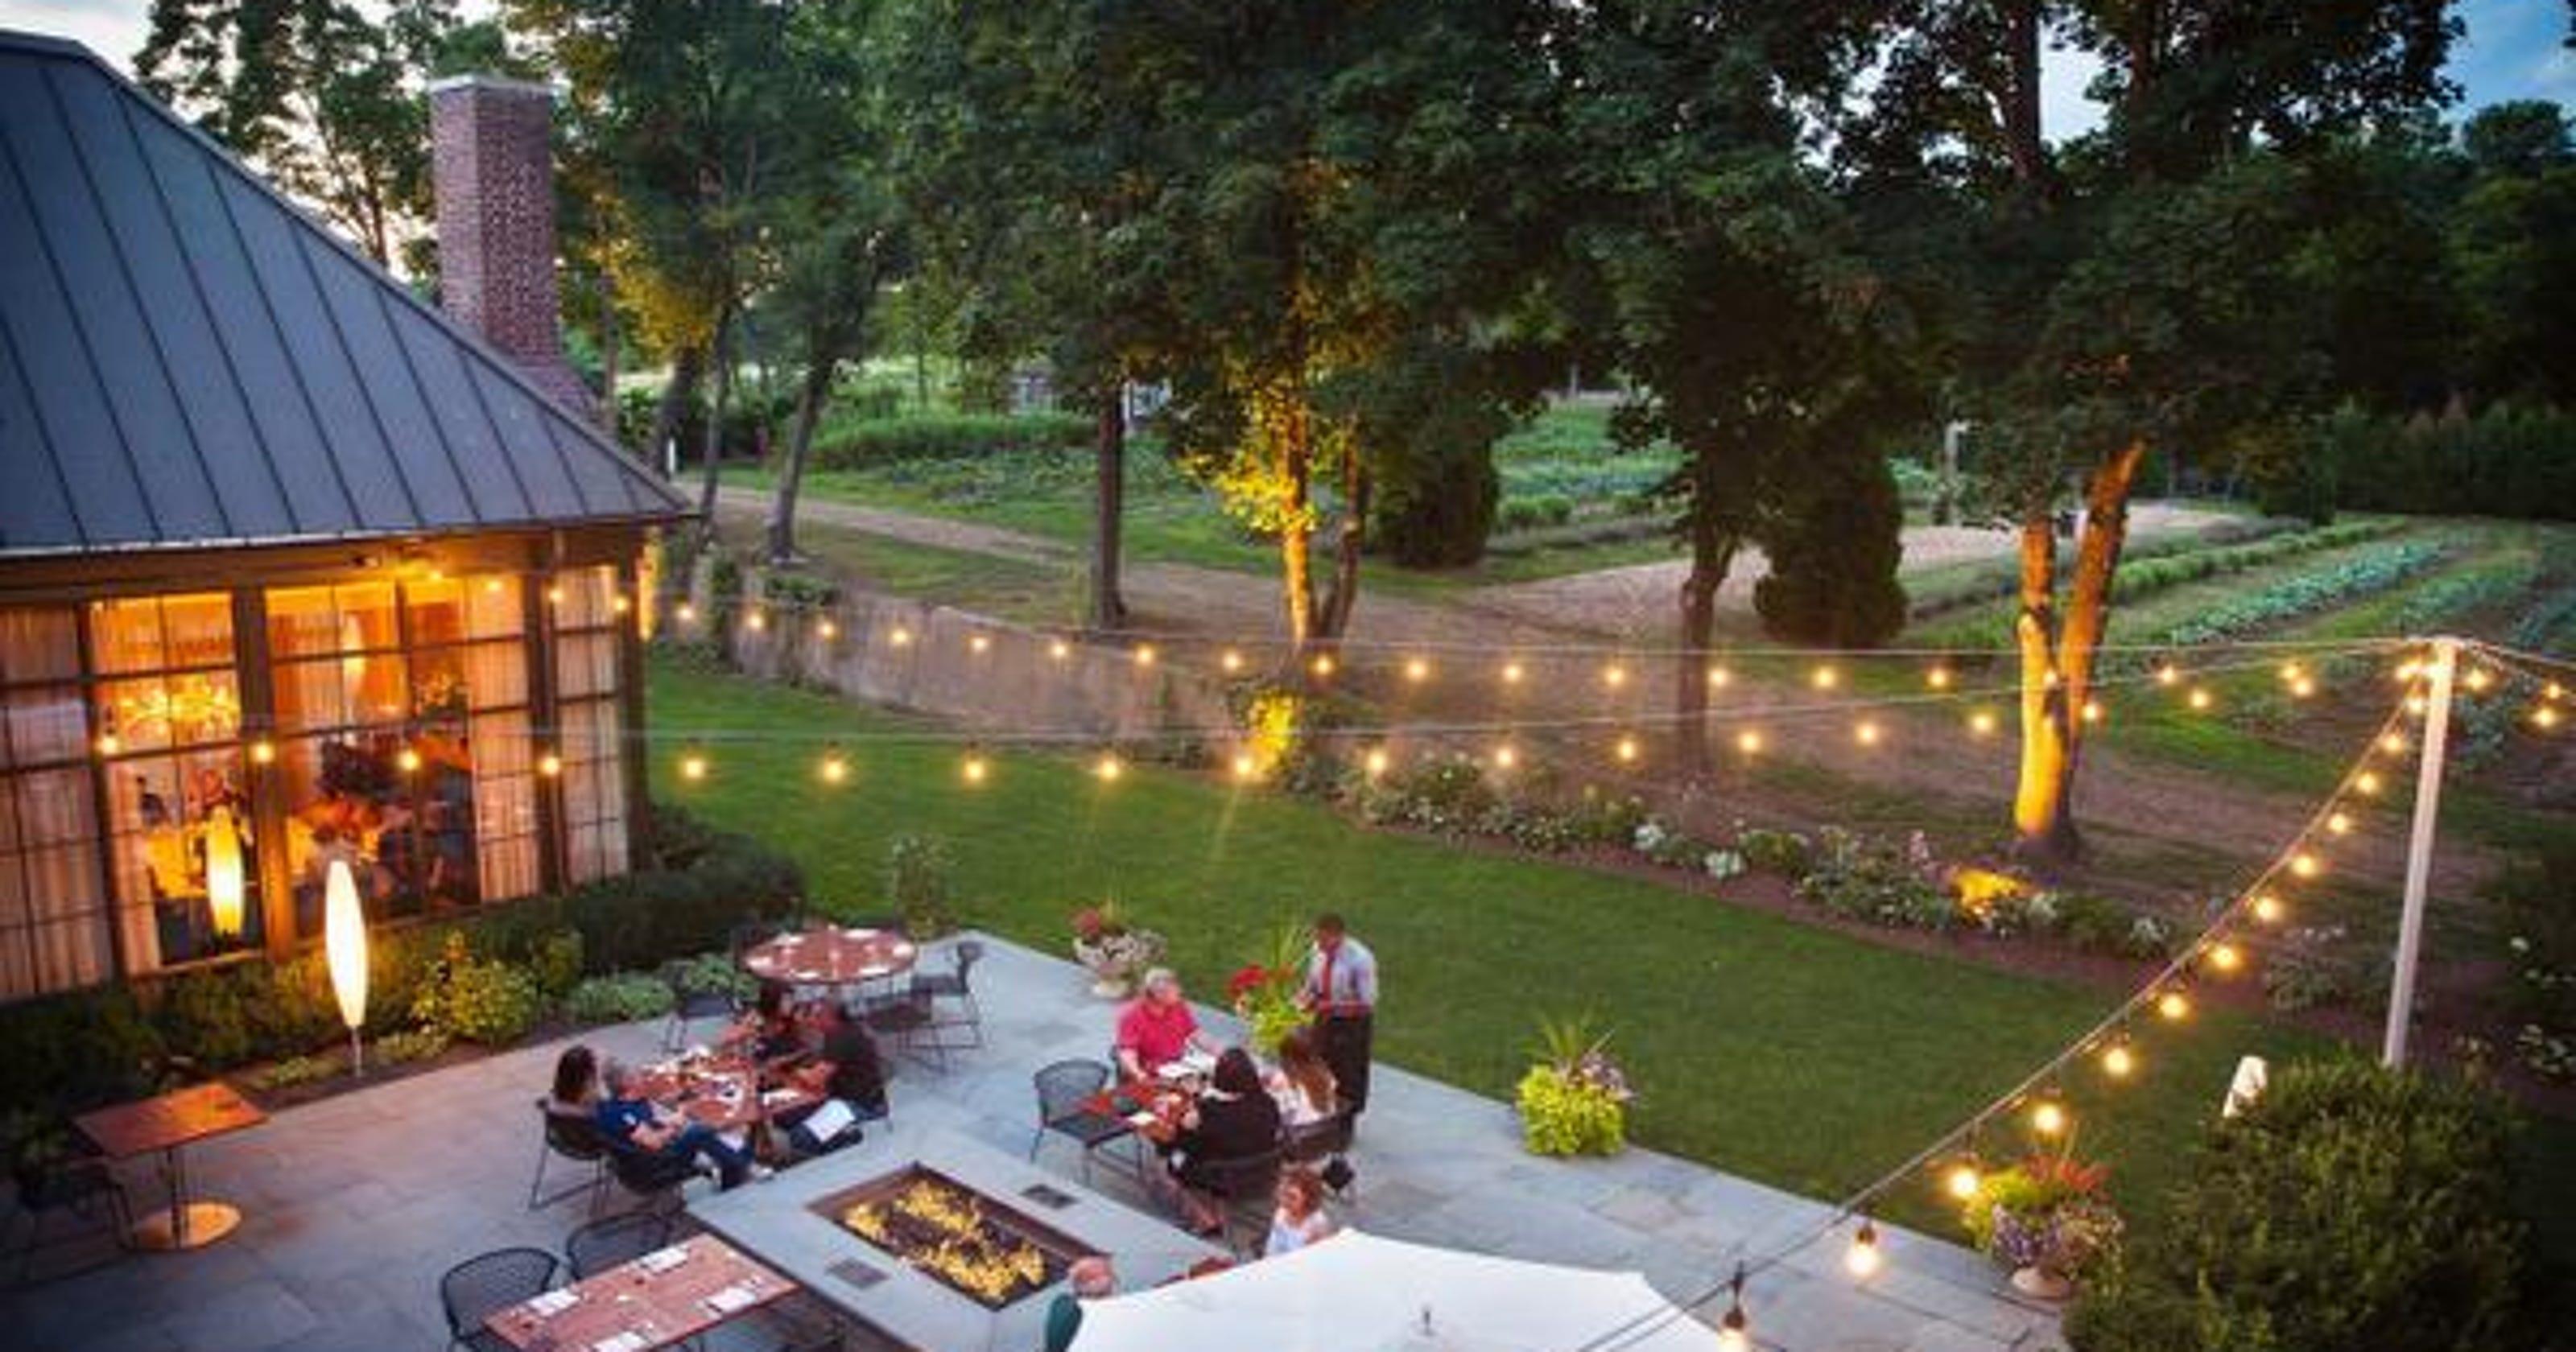 10 New Jersey restaurants worth the road trip